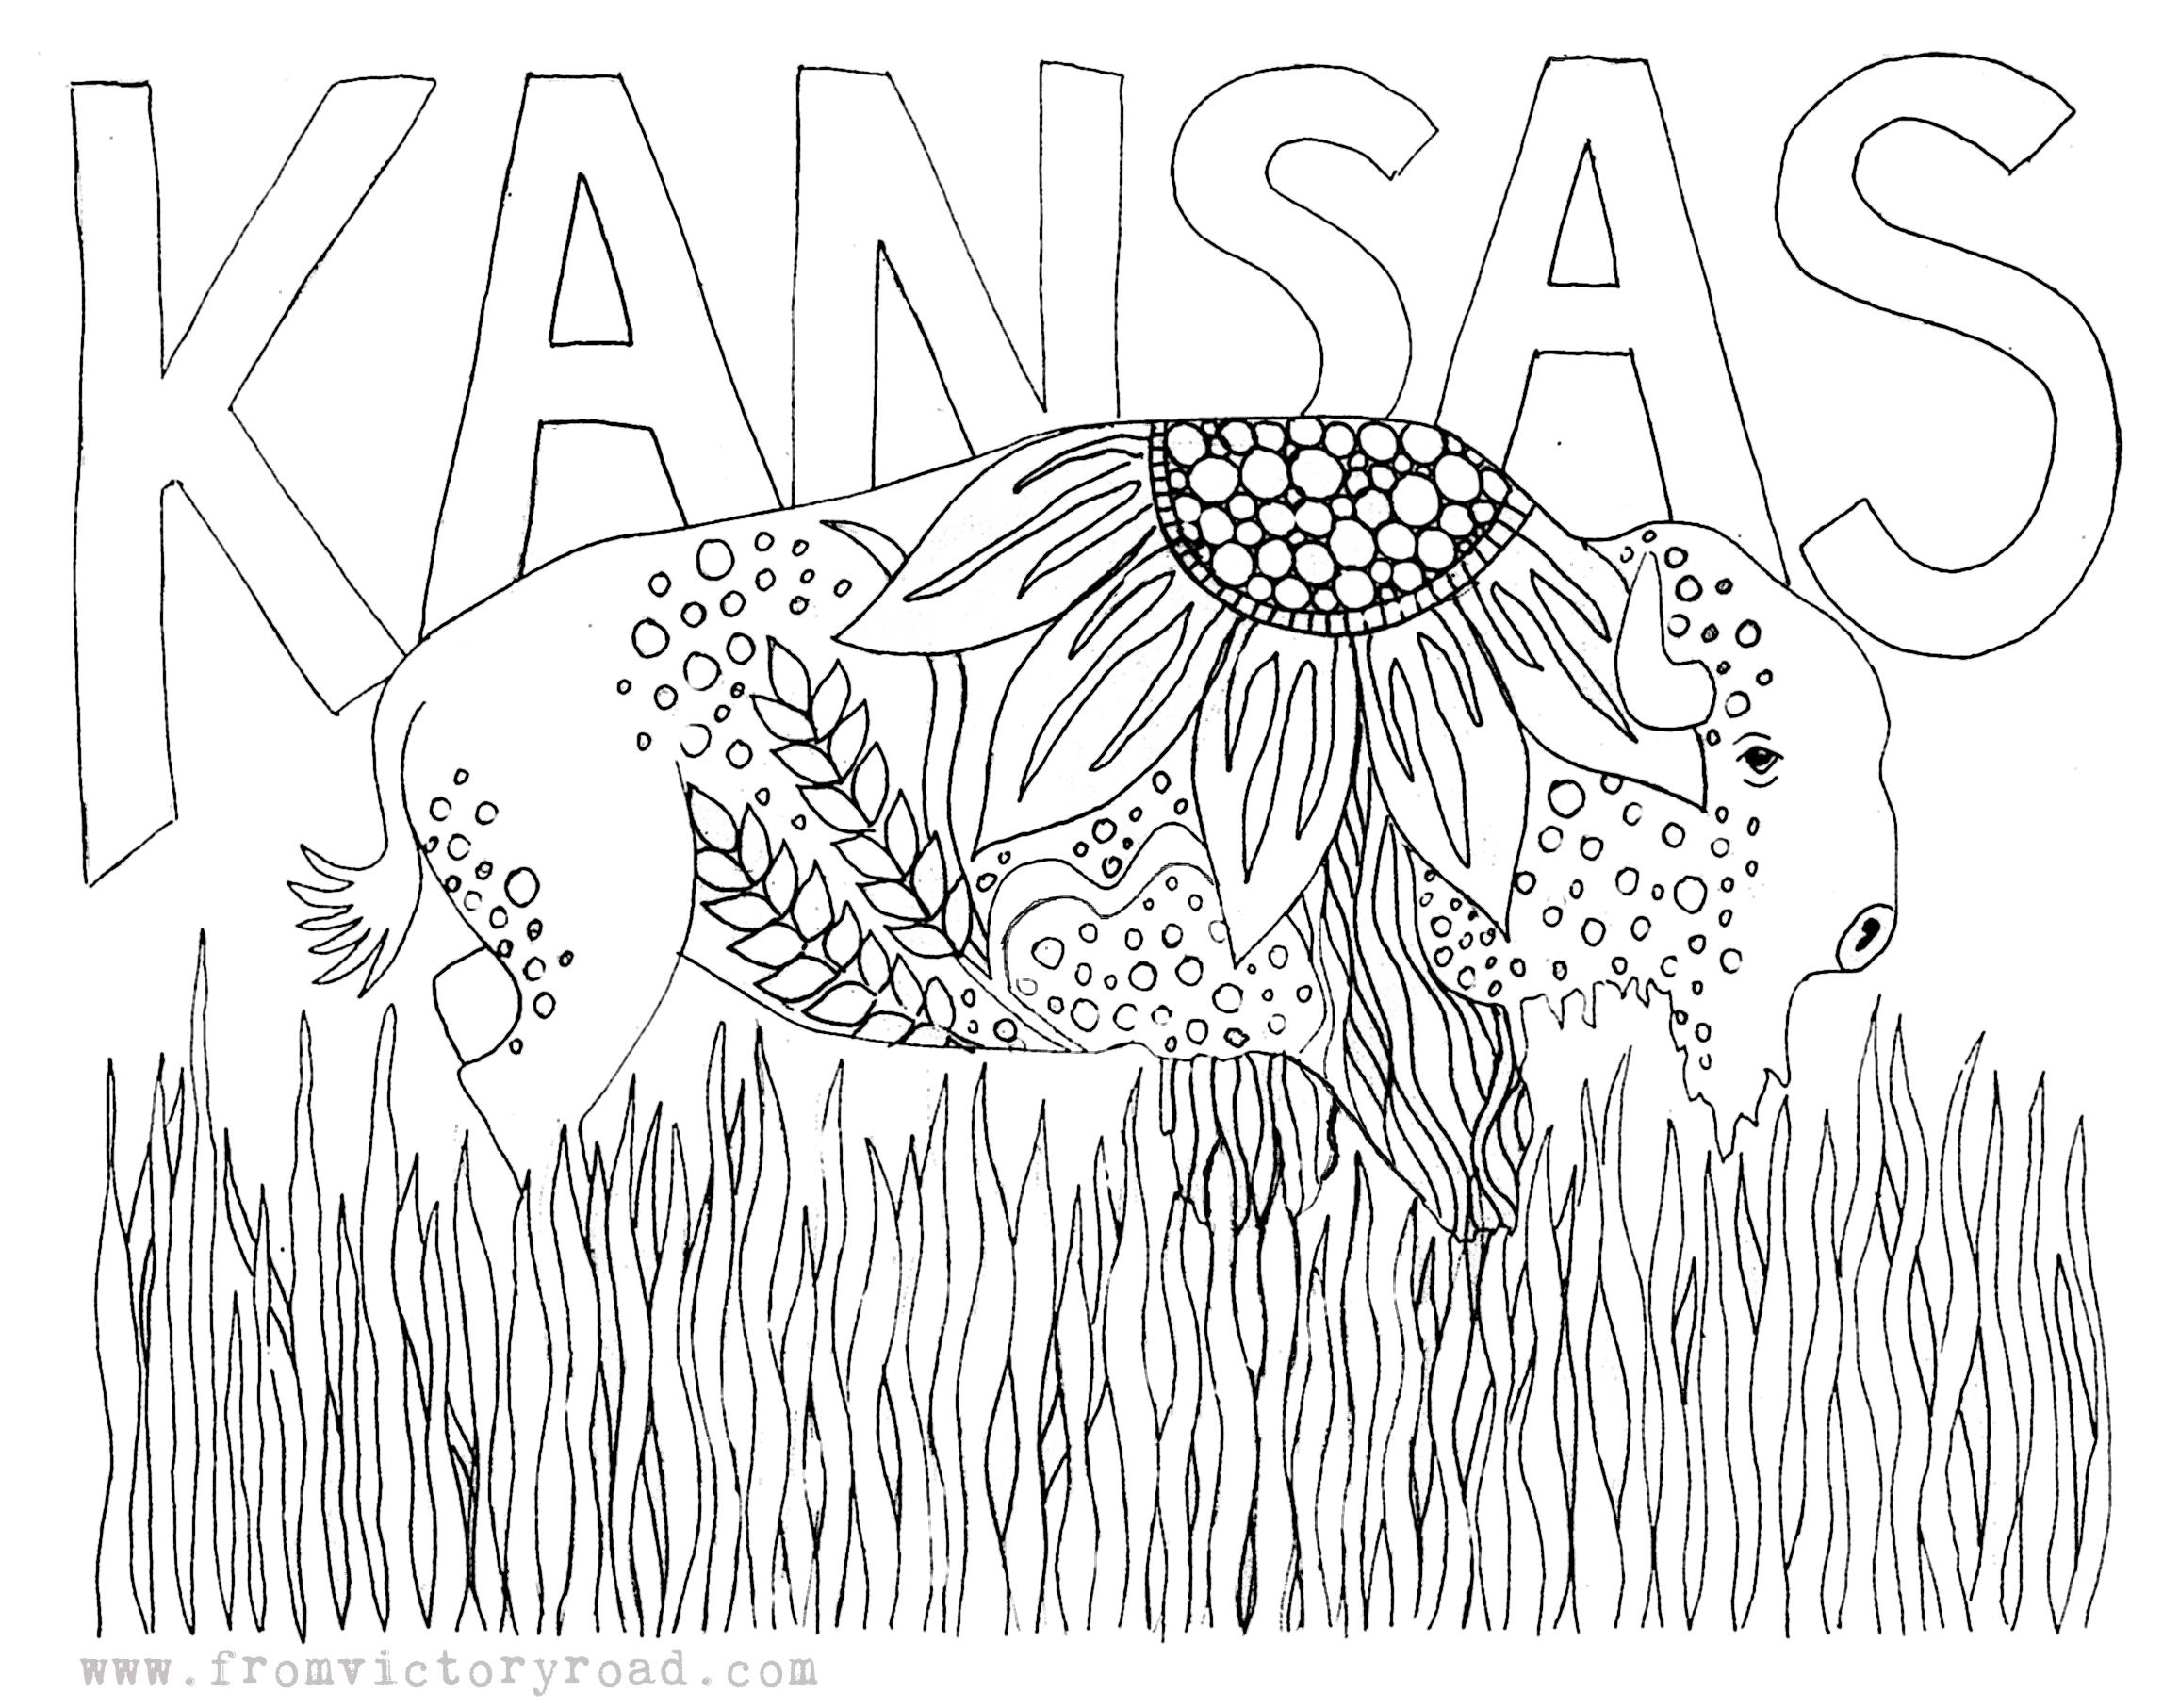 kansas-coloring-page